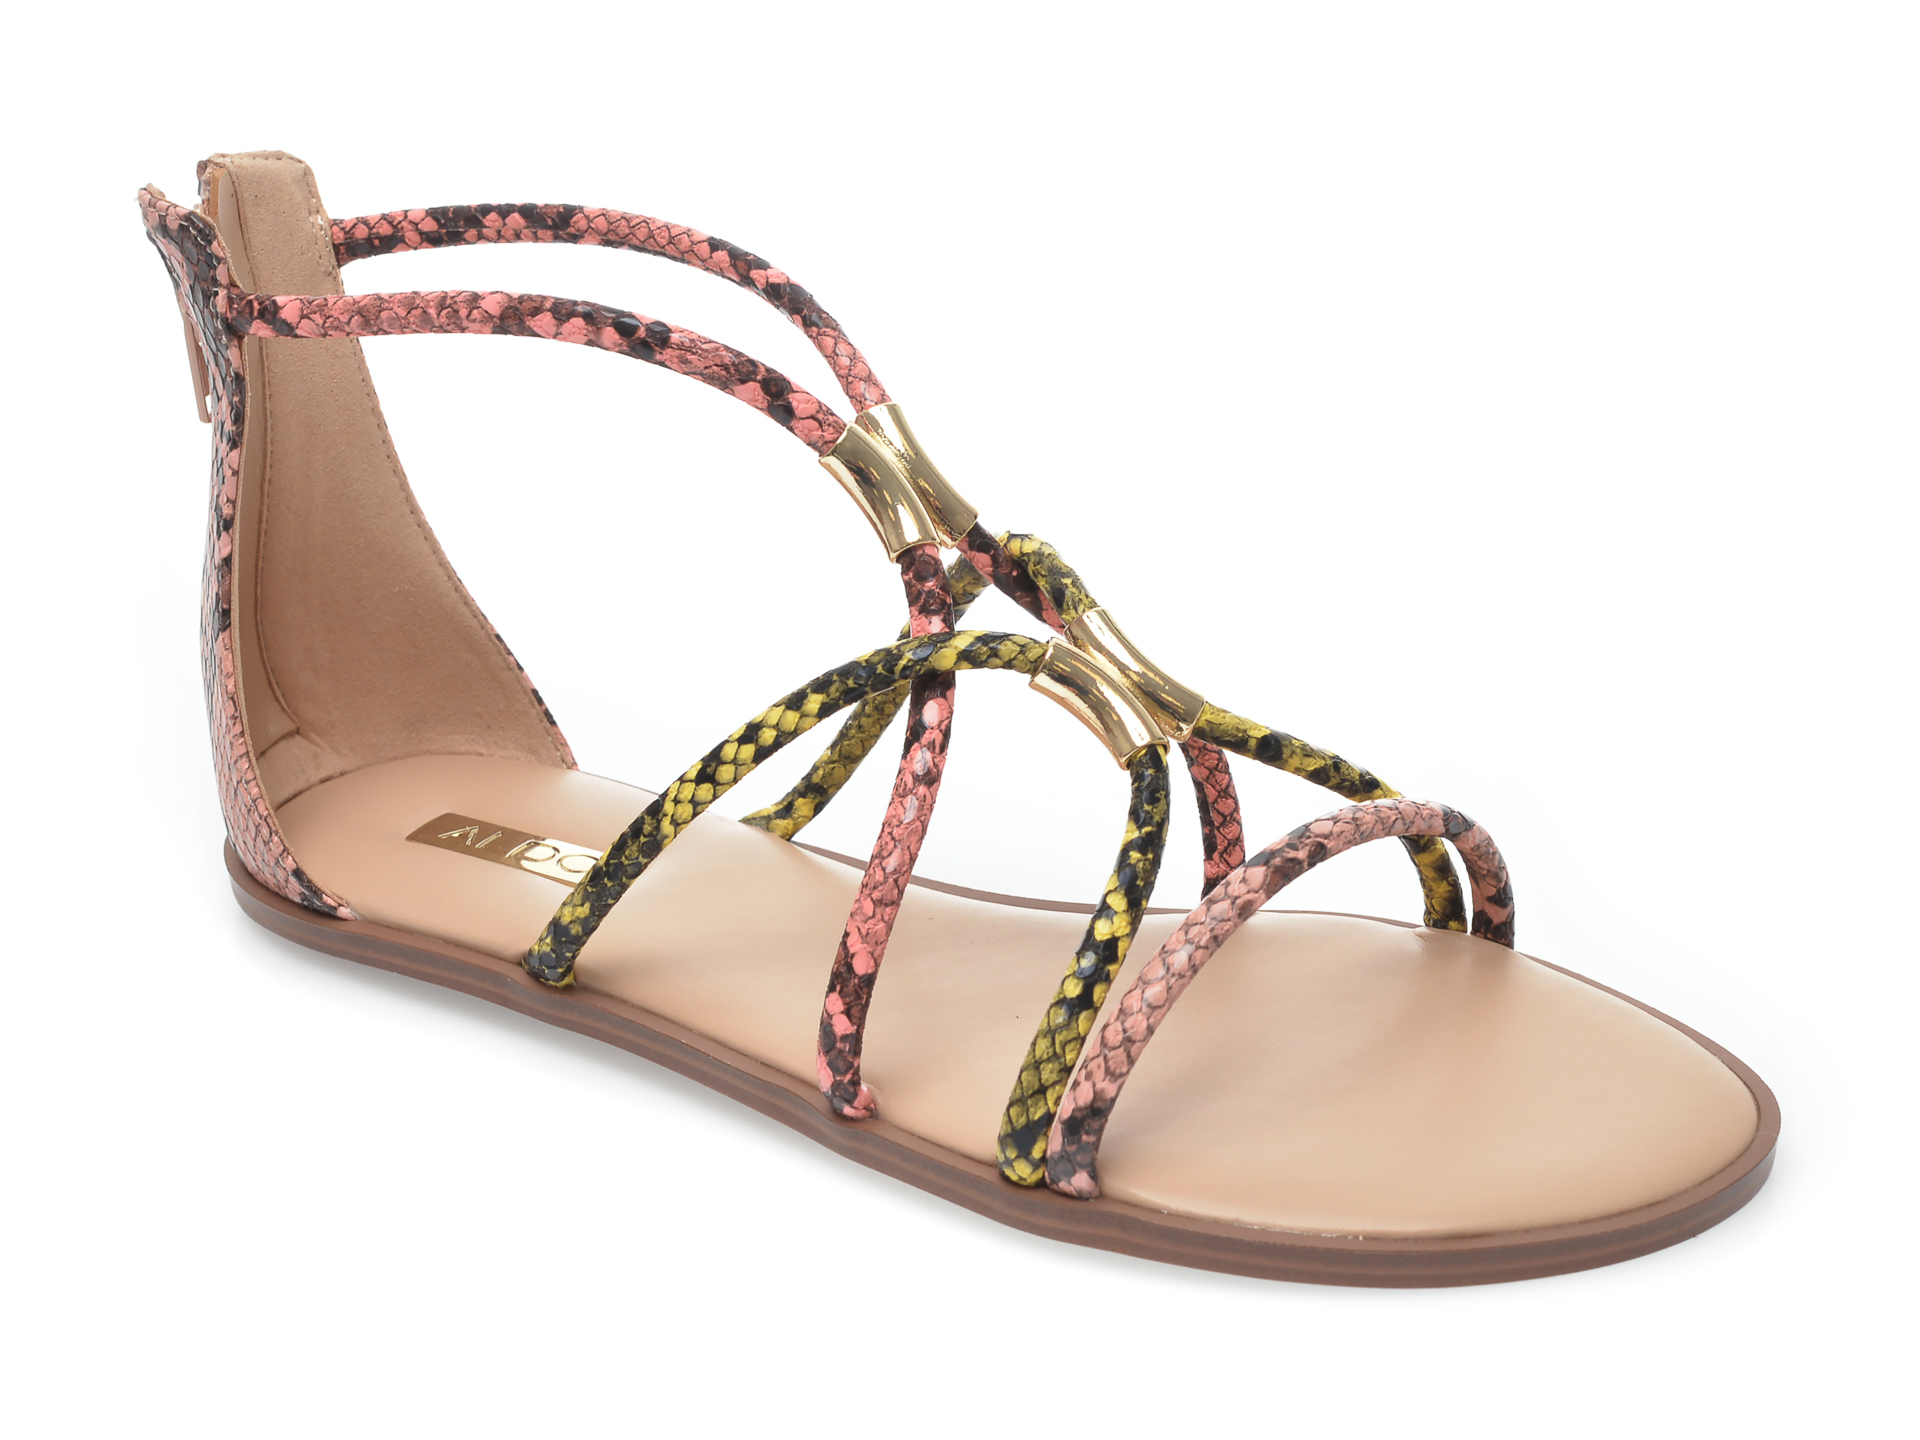 Sandale ALDO multicolor, Pozoa960, din piele ecologica imagine otter.ro 2021